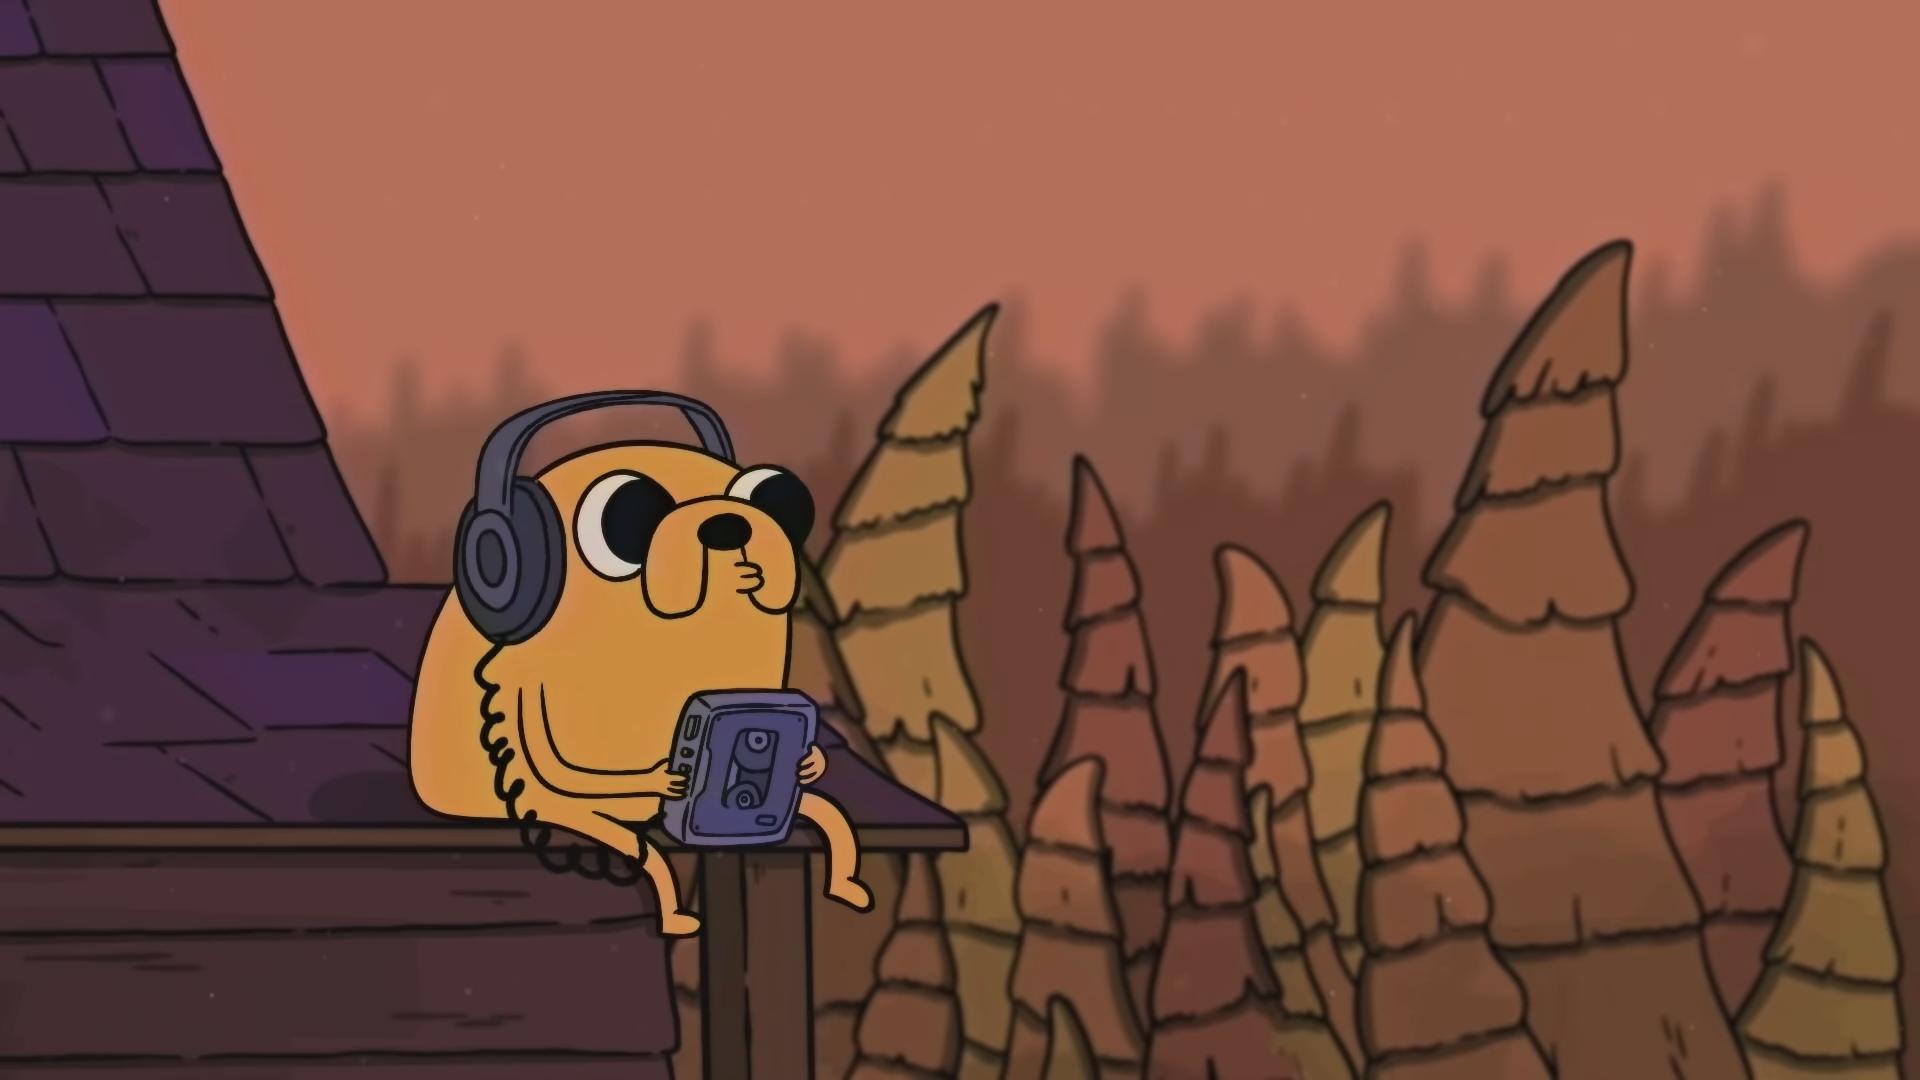 Adventure Time Jake Chill Out Vibes Music LoFi The Bootleg Boy 2 Headphones Walkman 1920x1080